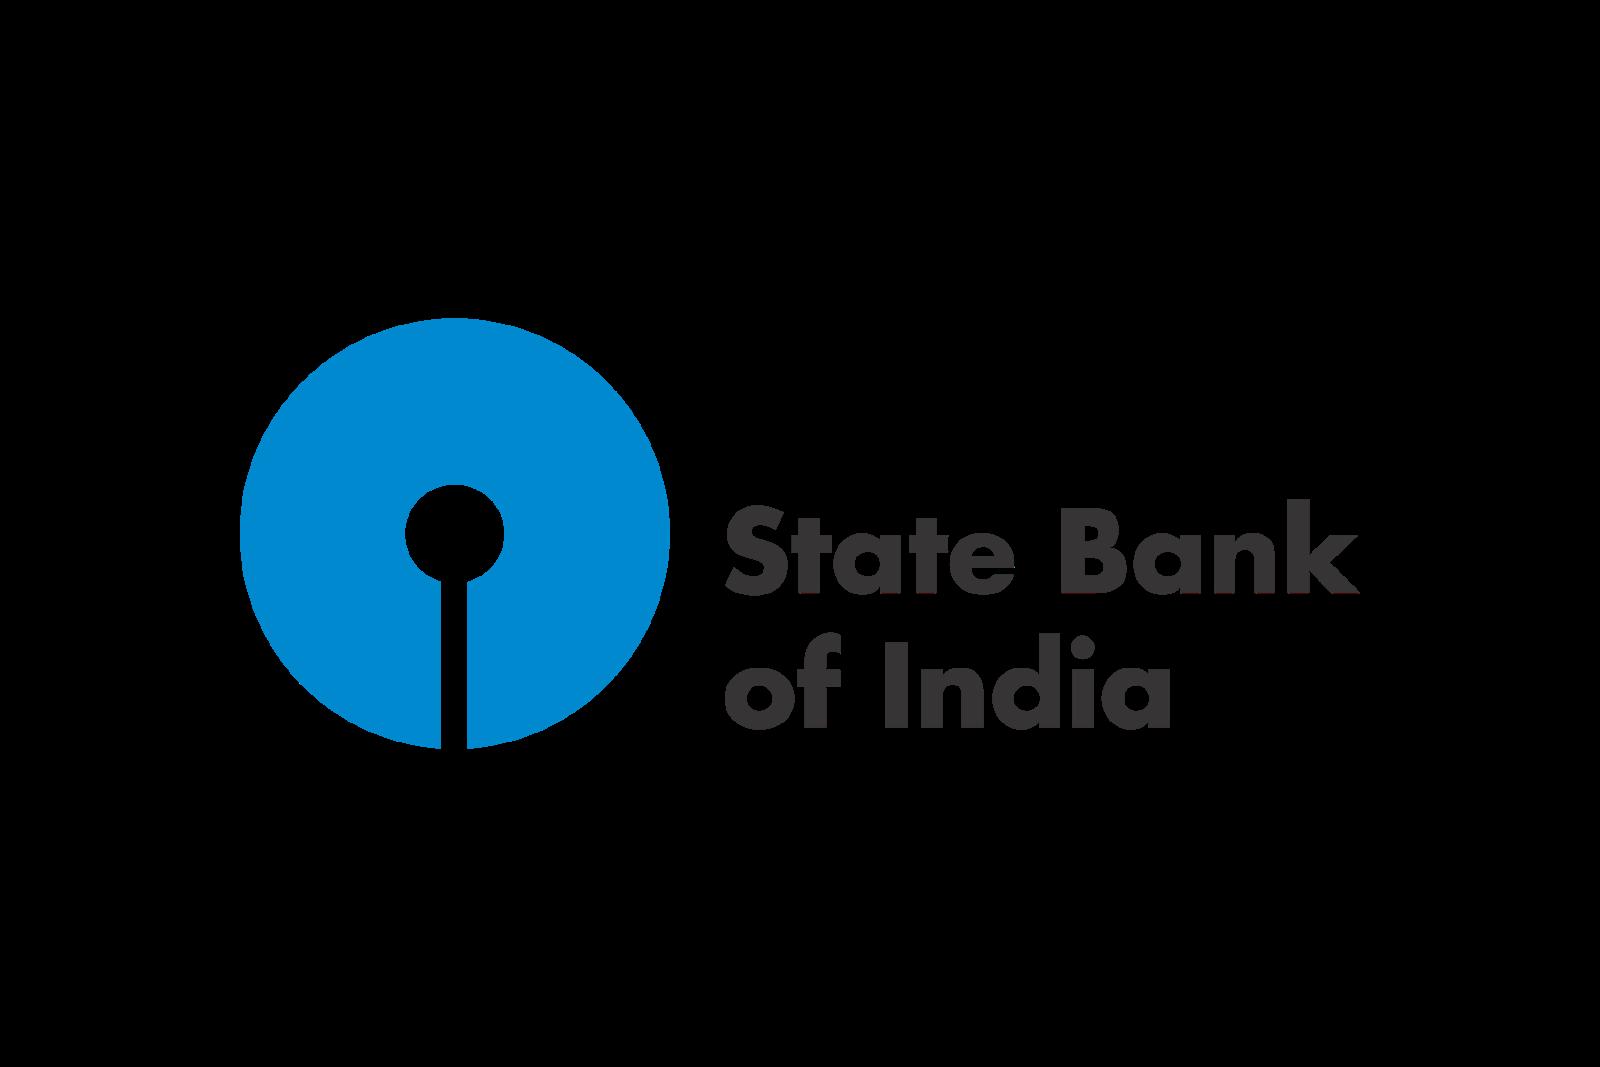 state bank of india logo logoshare